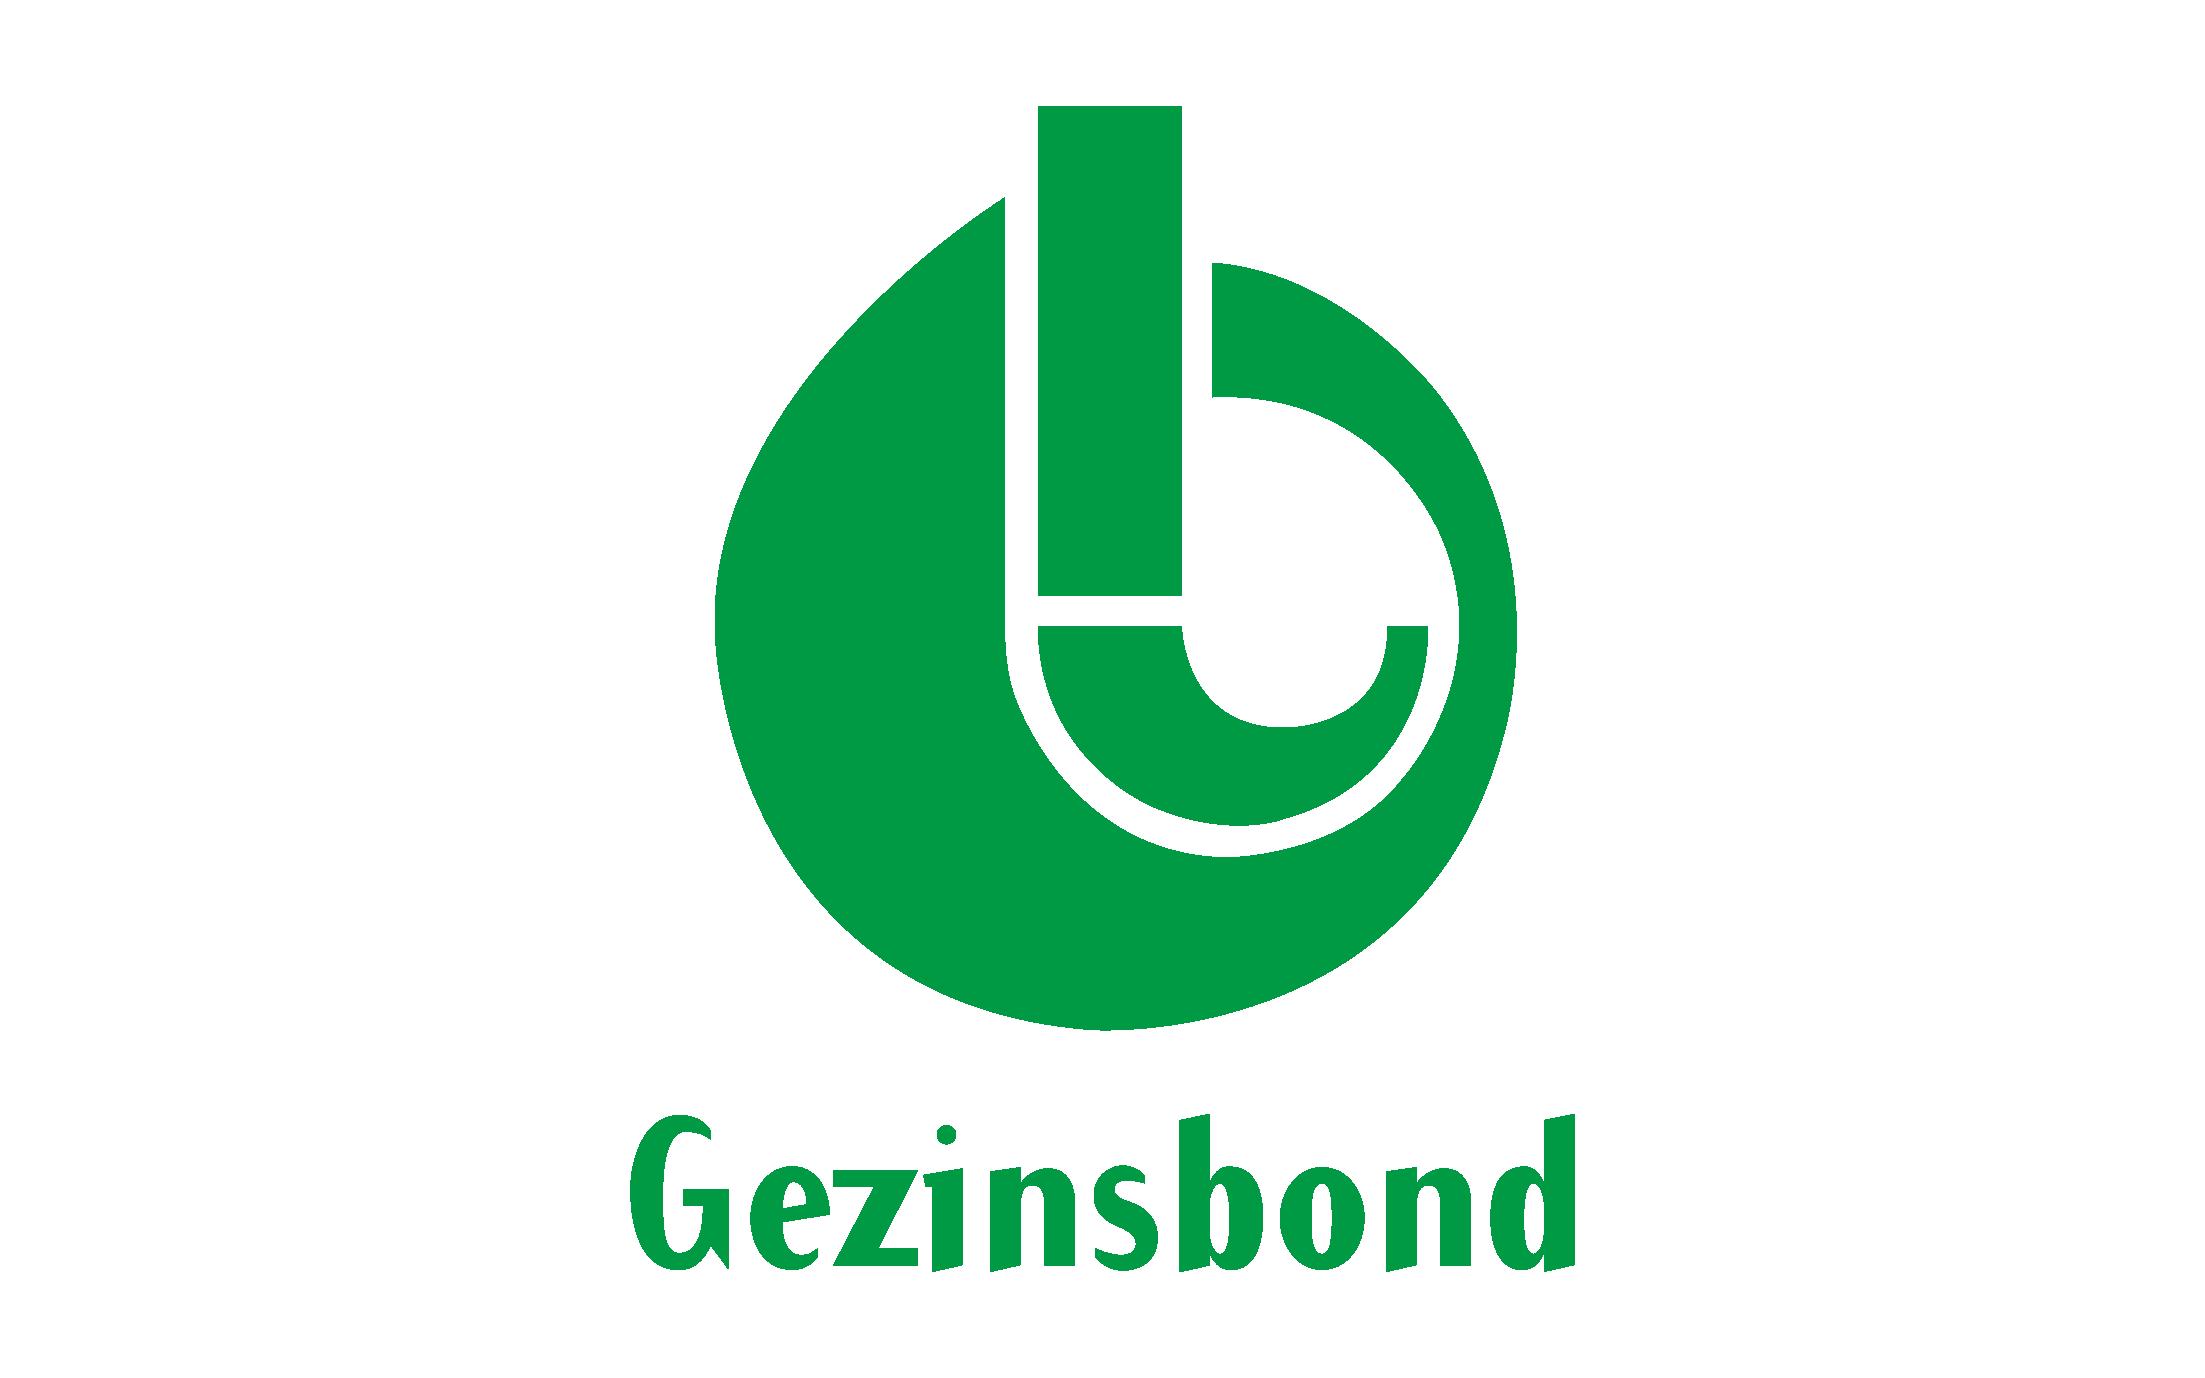 Gezinsbond